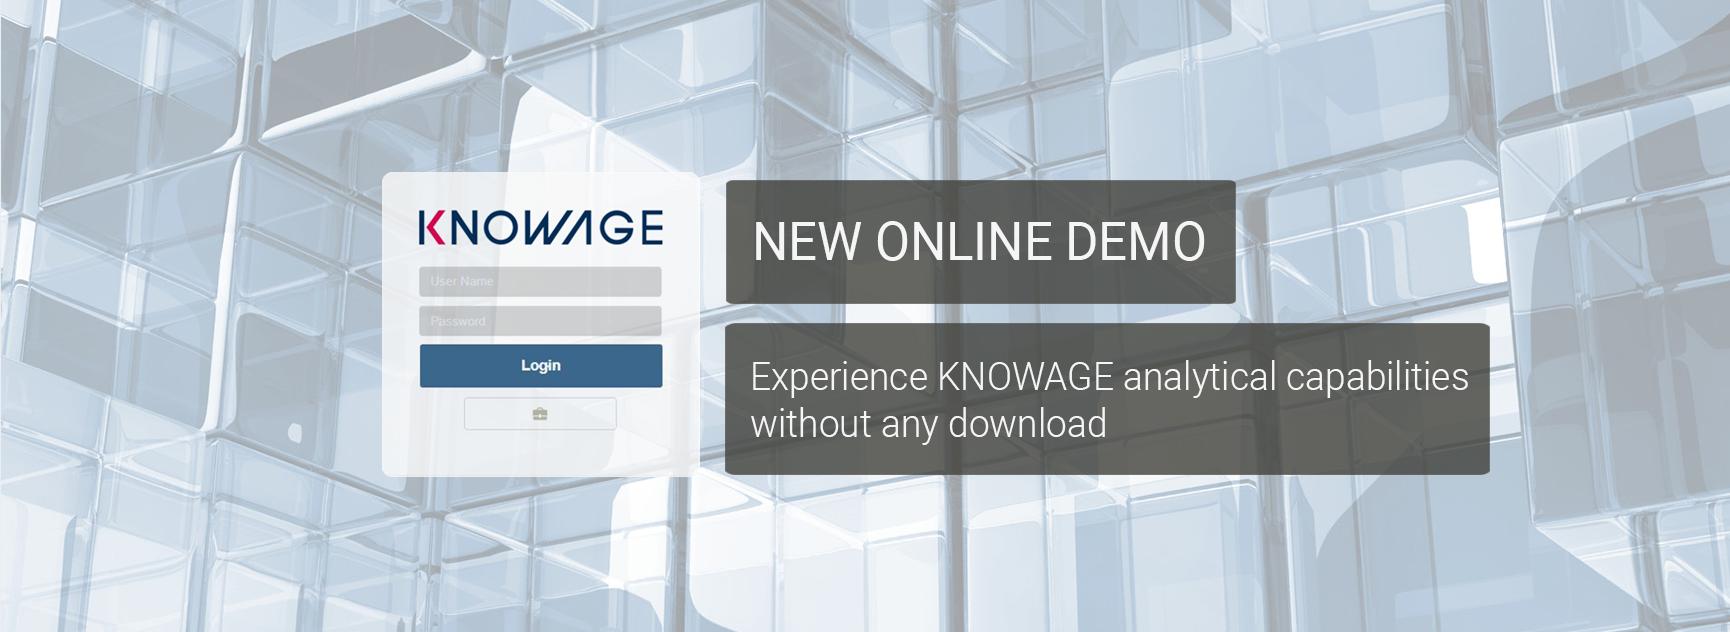 Knowage online demo